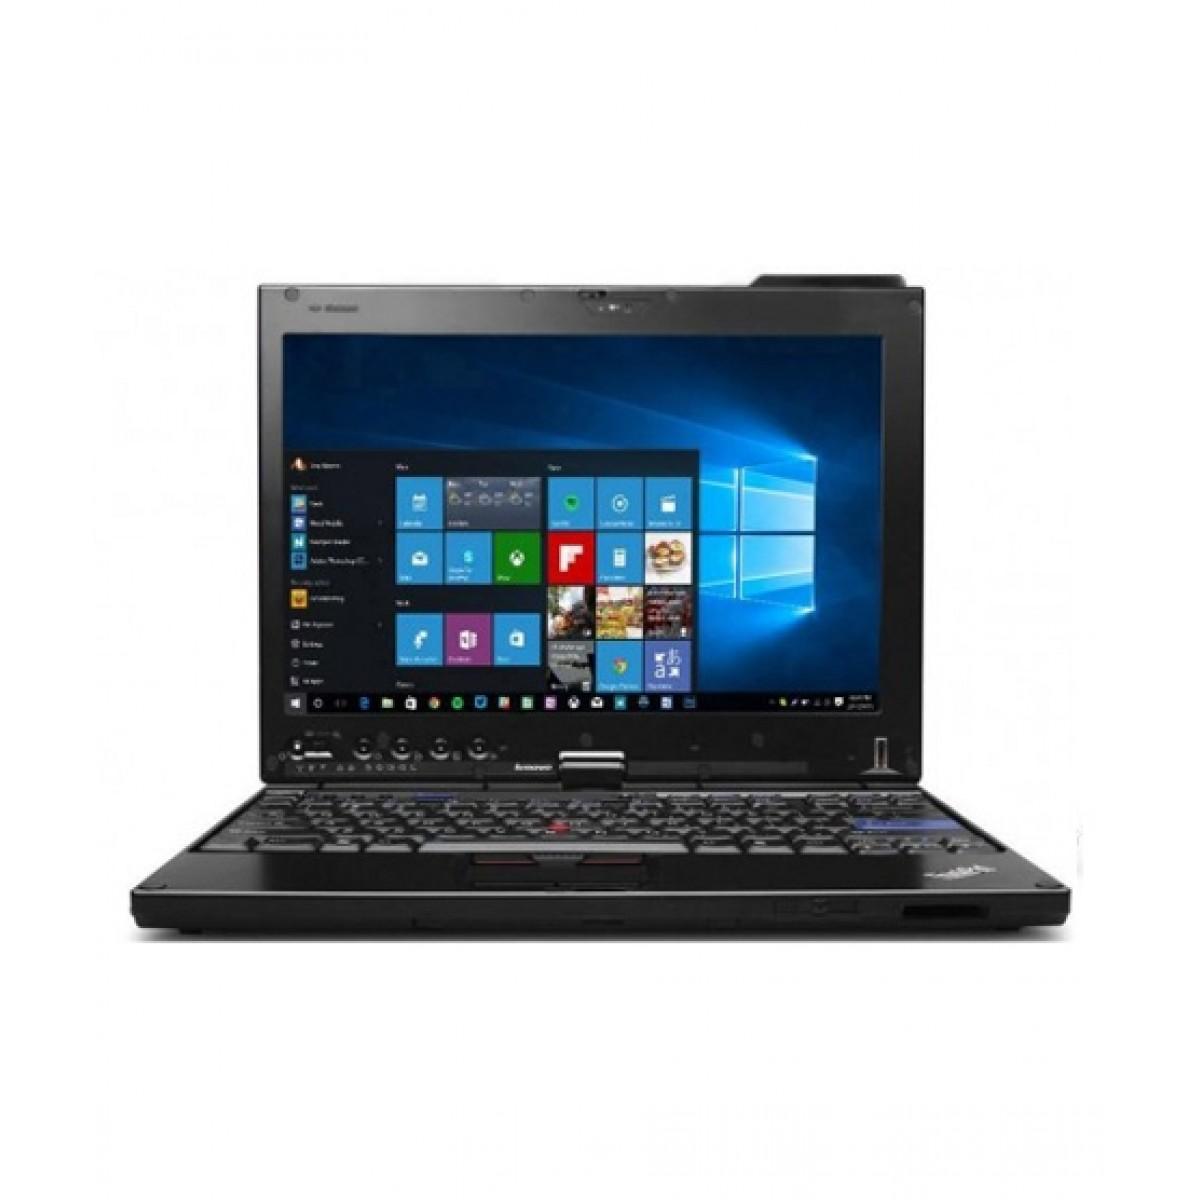 "Lenovo ThinkPad X220 12"" Core i5 2,5 GHz - SSD 128 GB - 4GB AZERTY - Ranska"